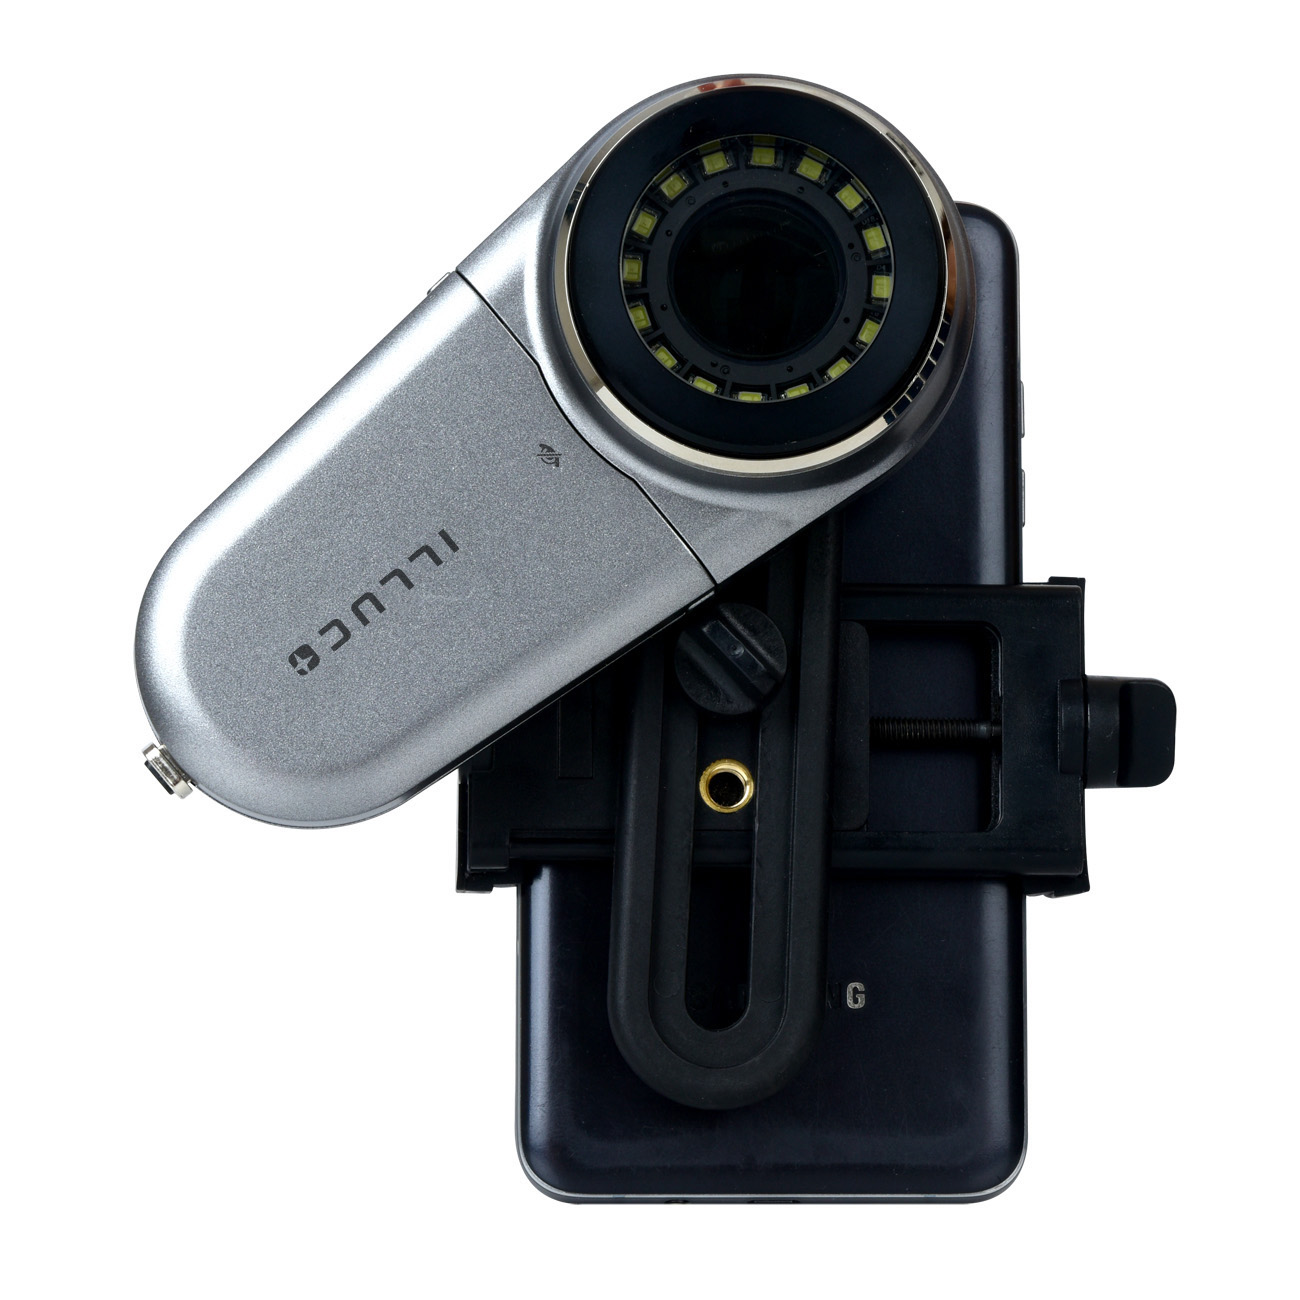 Dermatoscope_IDS-Series_Adapter_Smartphone_Universal (누끼) (3)